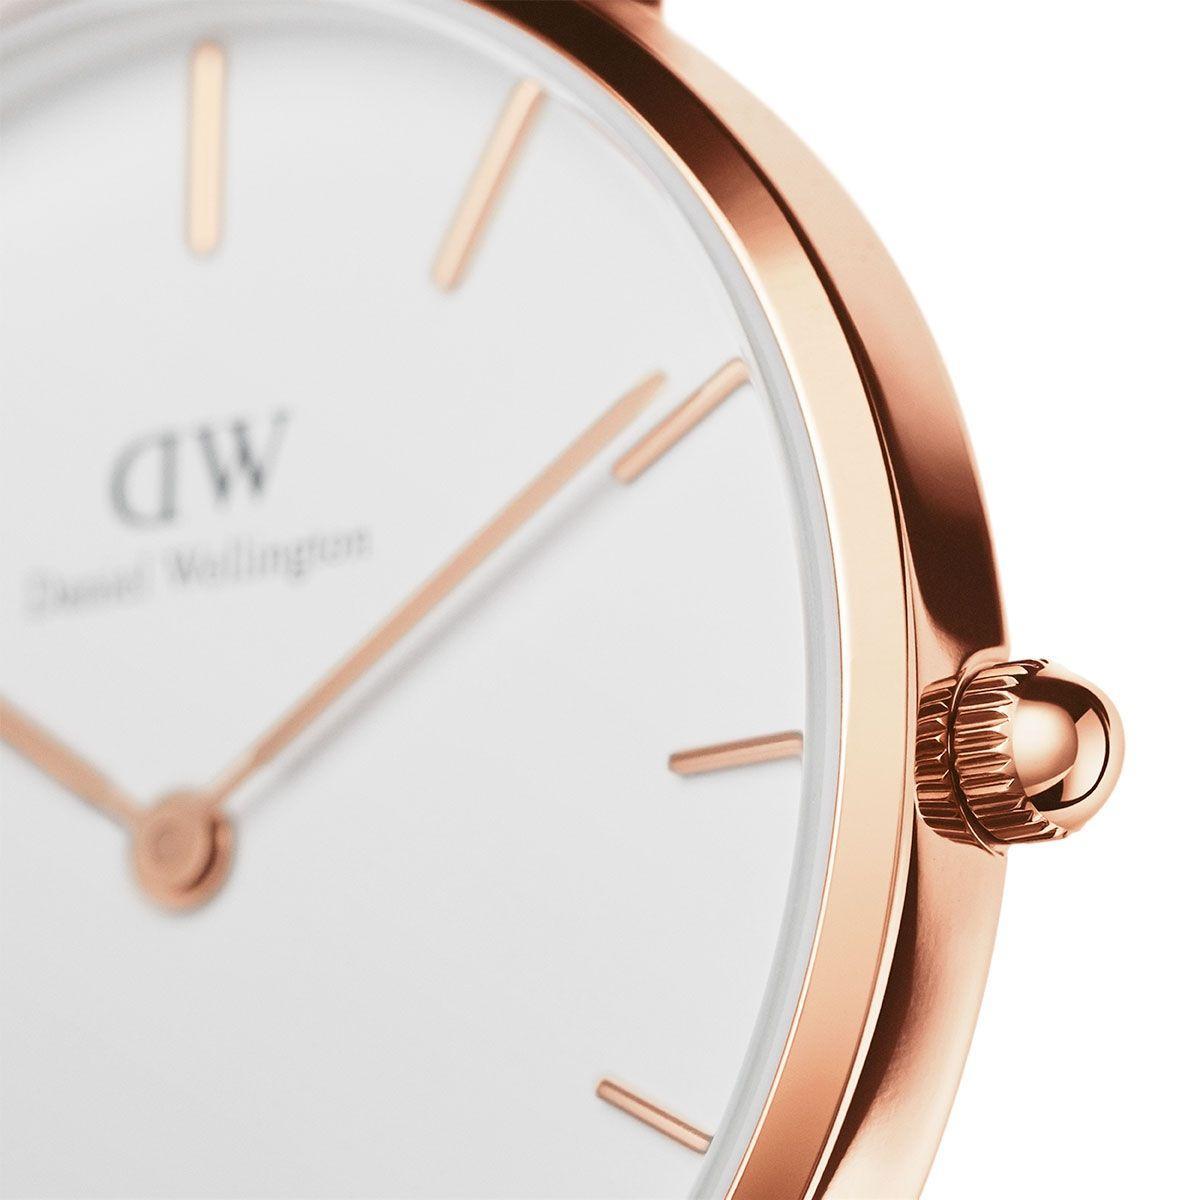 dw官网 dw手表官网 dw中国官网 dw官方旗舰店 DW DW官网  Watch Petite Melrose RG 32mm